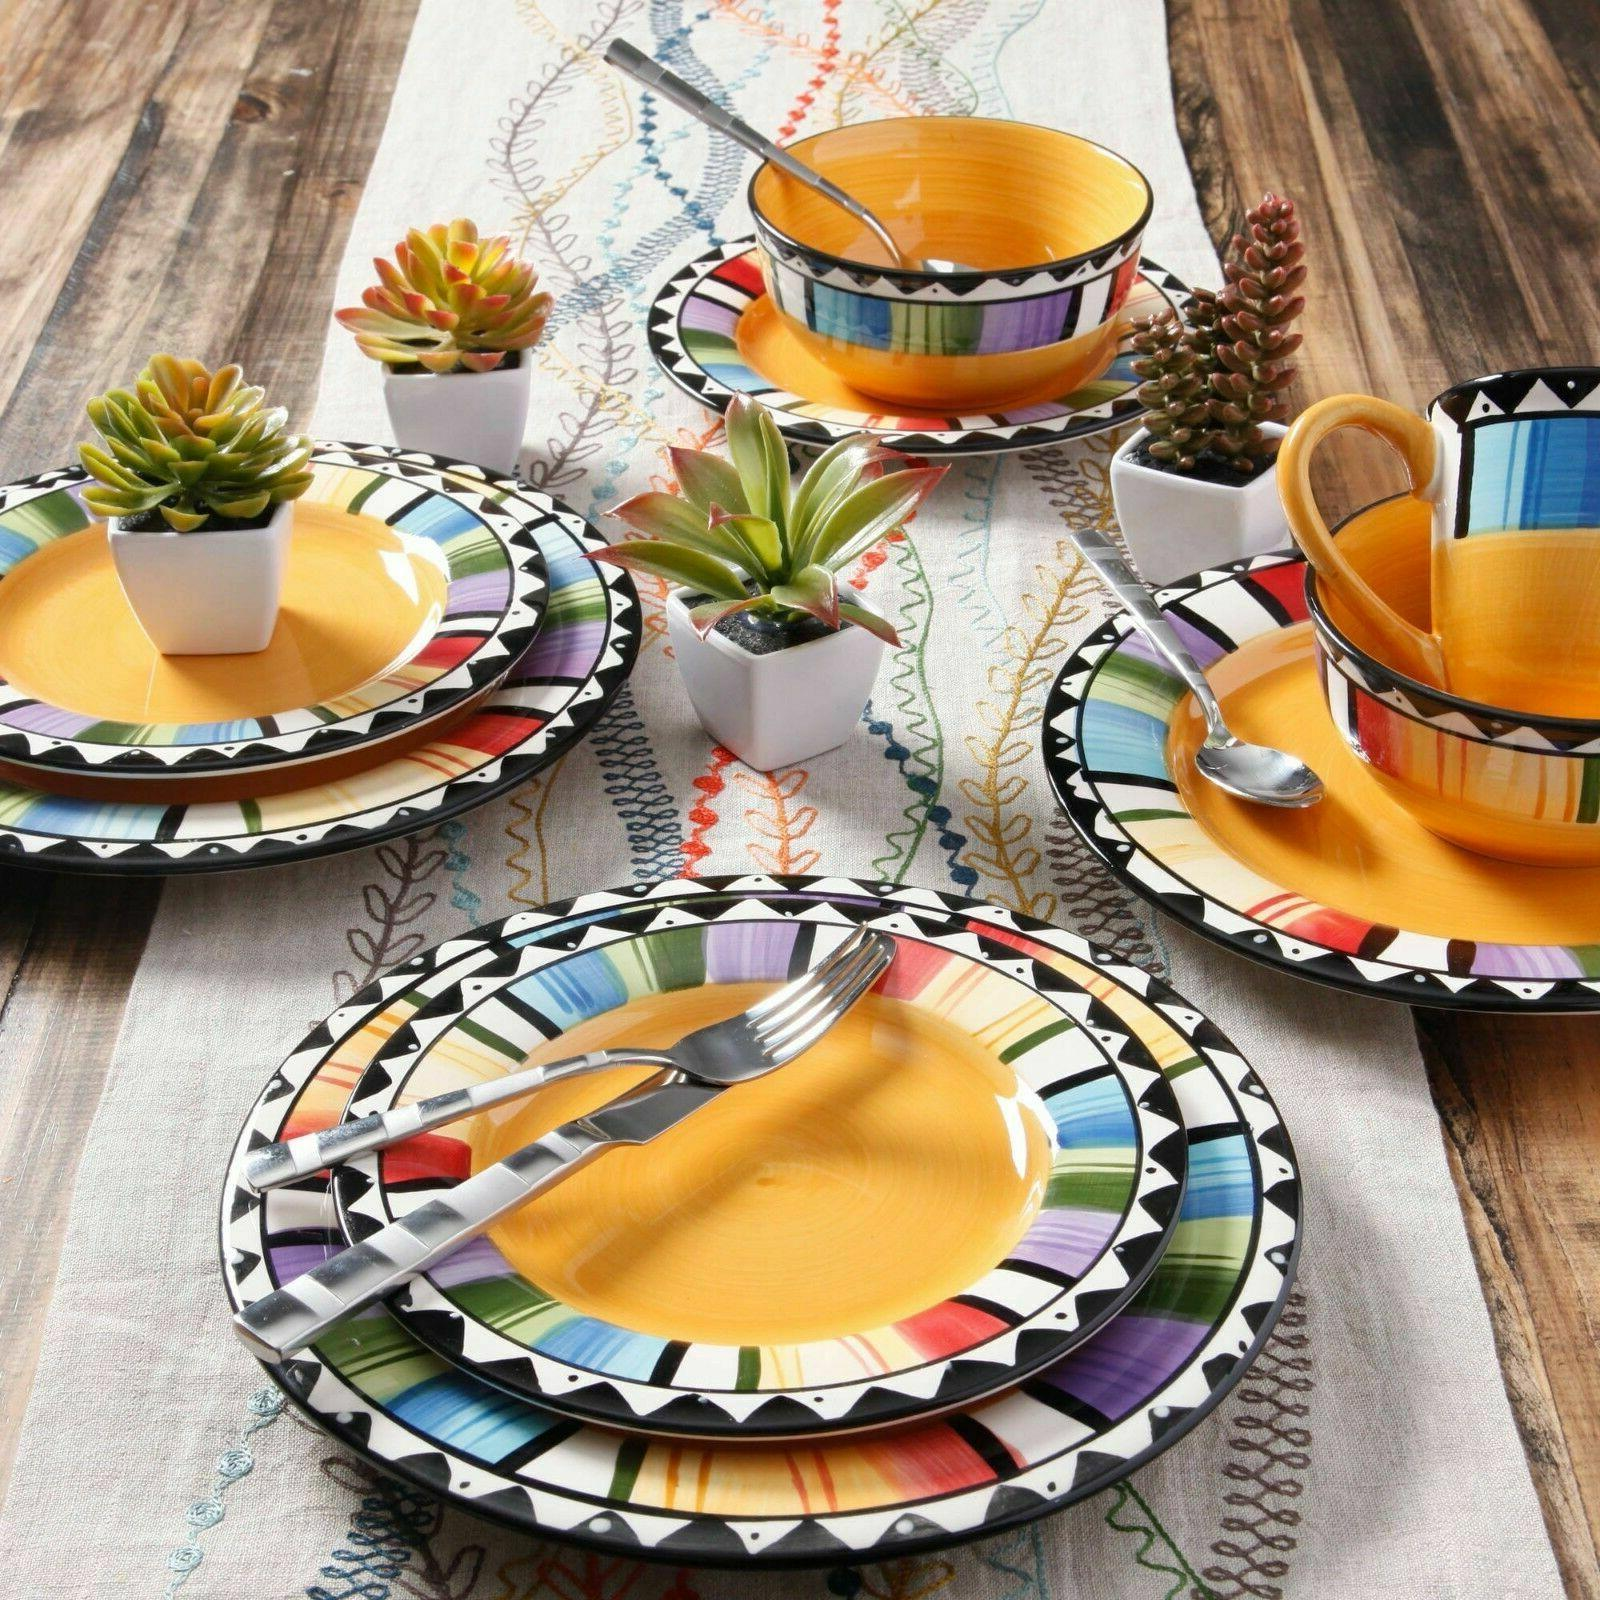 Fiesta Dinnerware 16 PC Set Dishes Plate Bowl Mug Stoneware